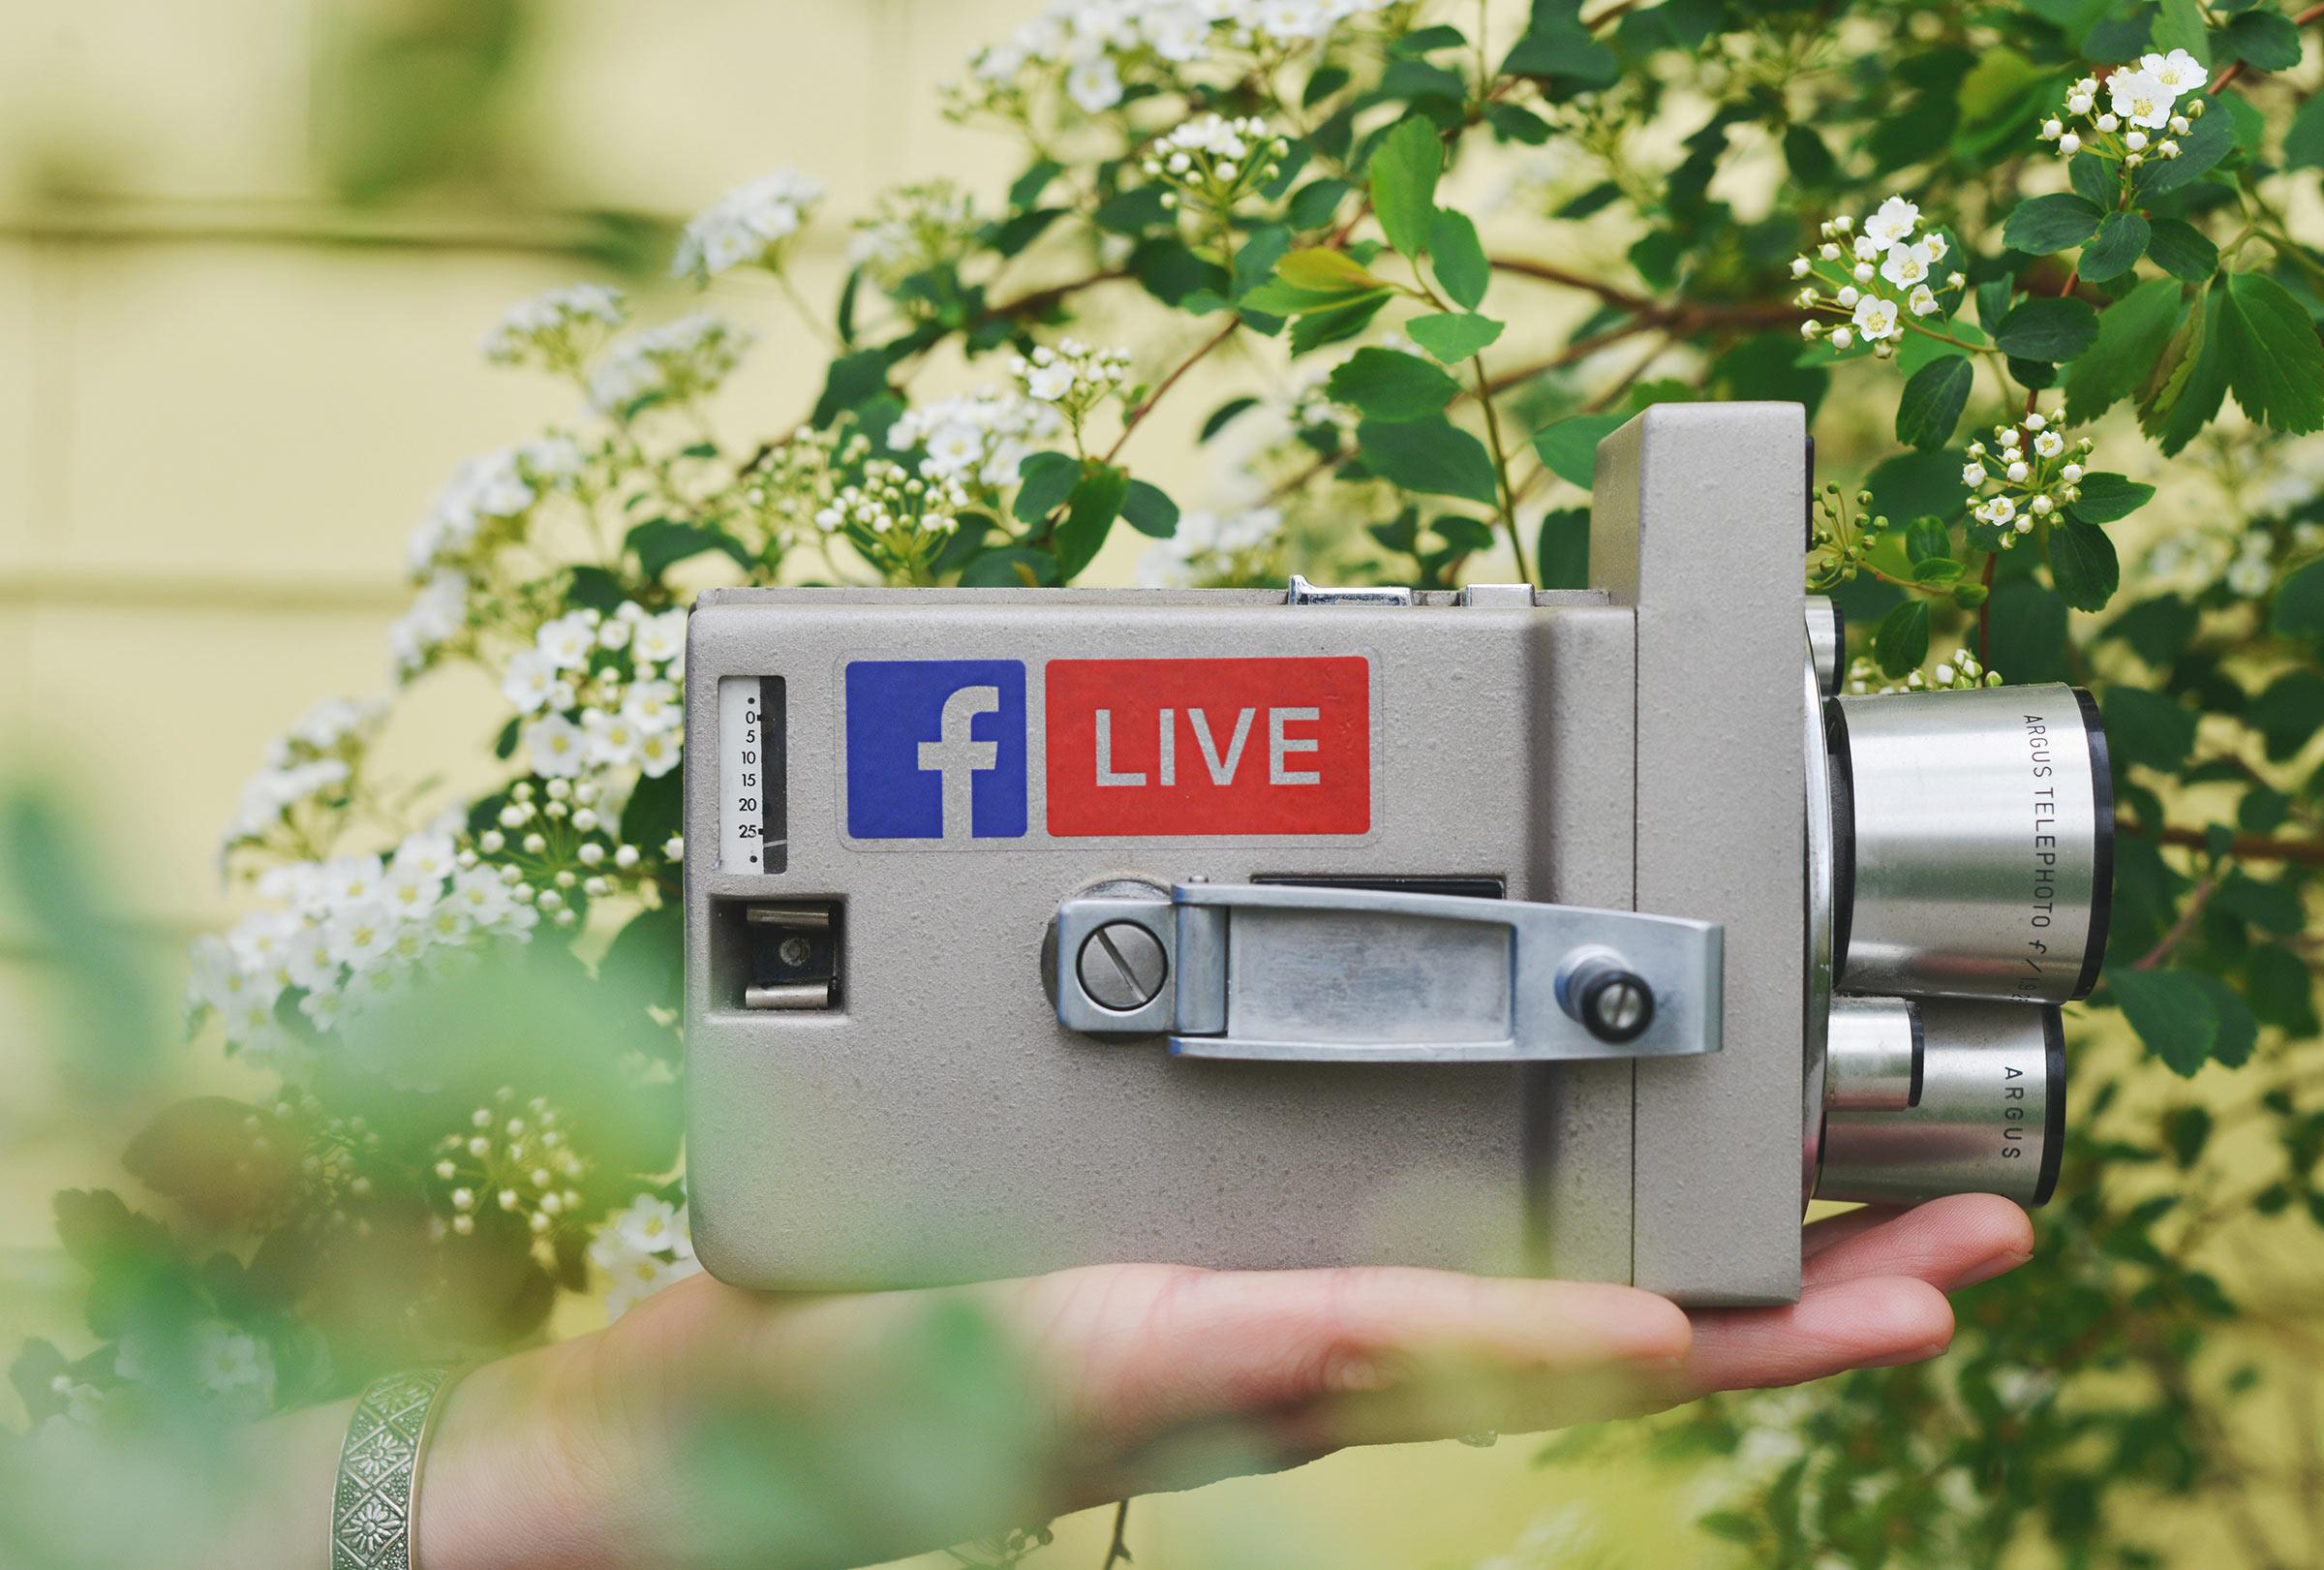 Facebook Live sticker on camera